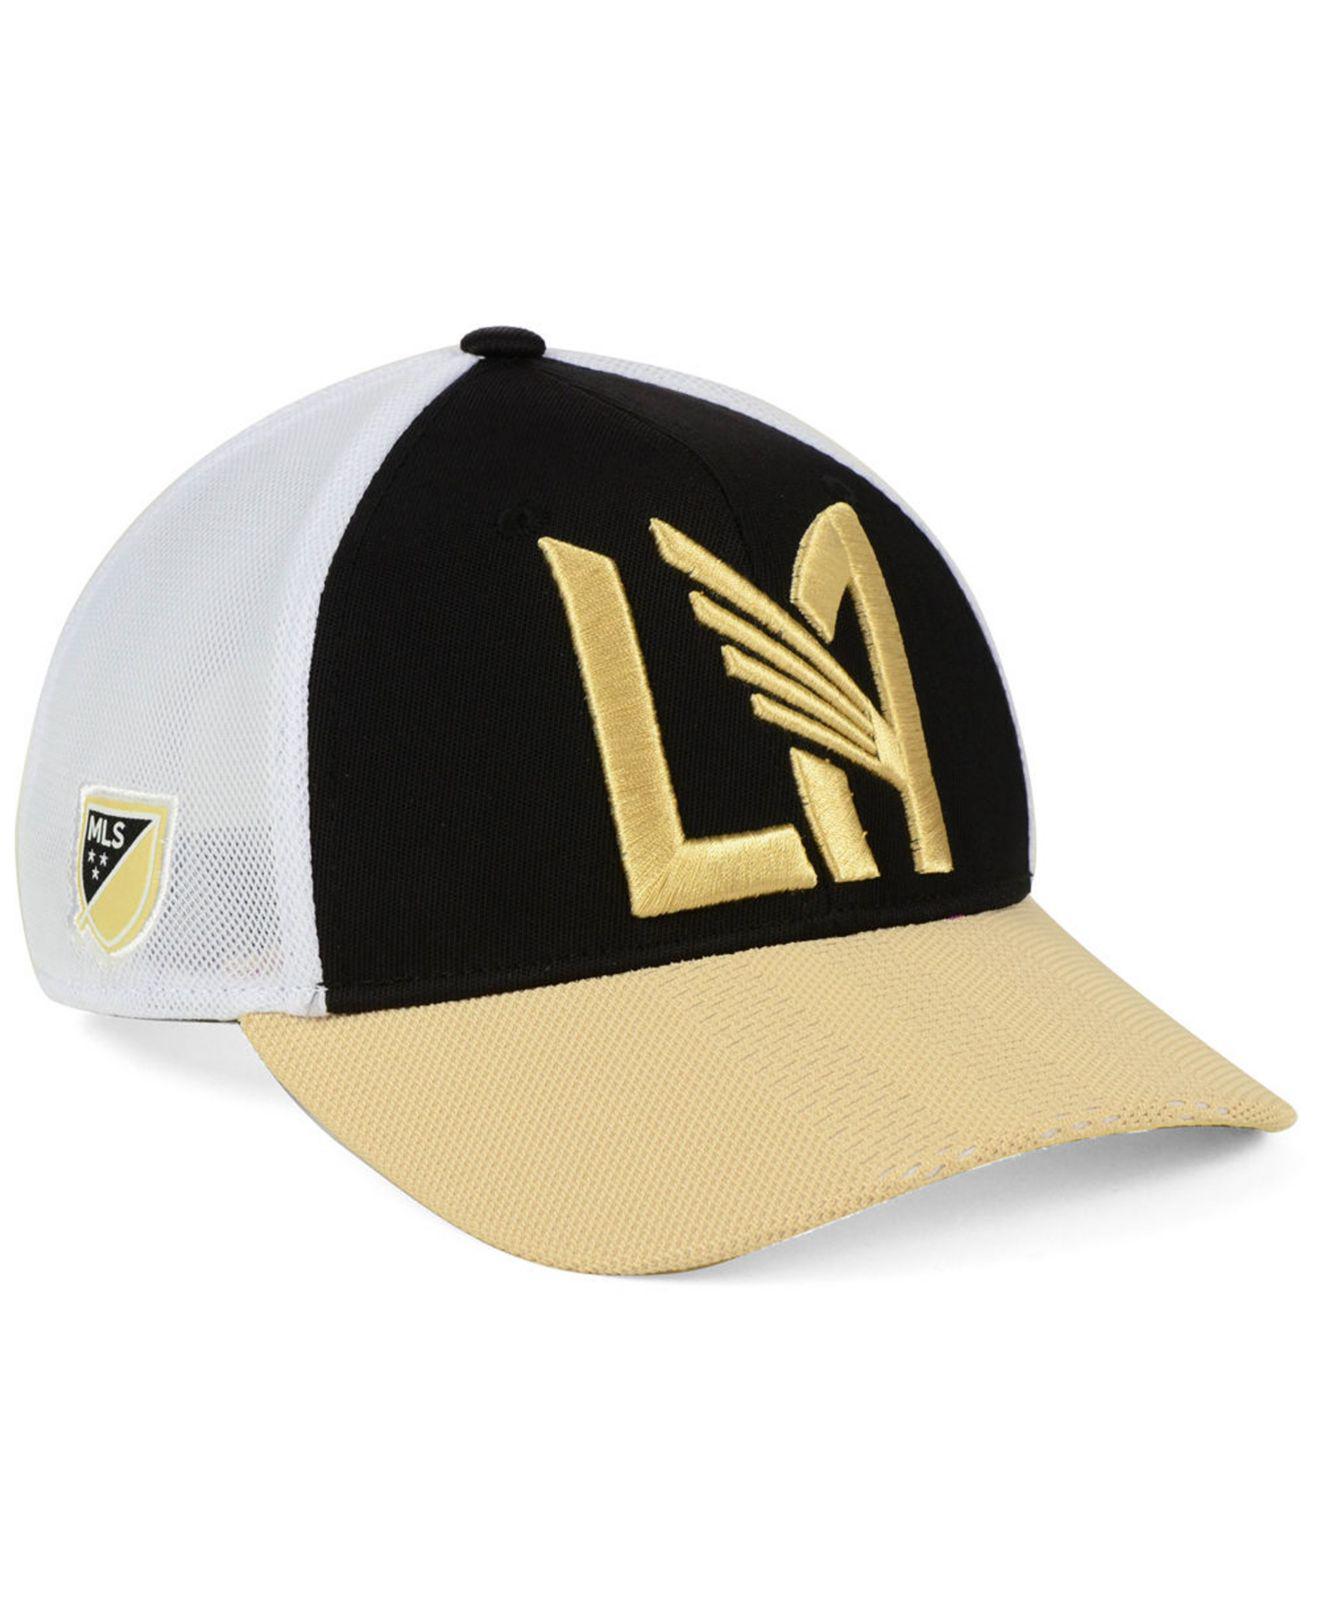 a0789fc8f0663 adidas. Men s Black Los Angeles Football Club Authentic Mesh Adjustable Cap